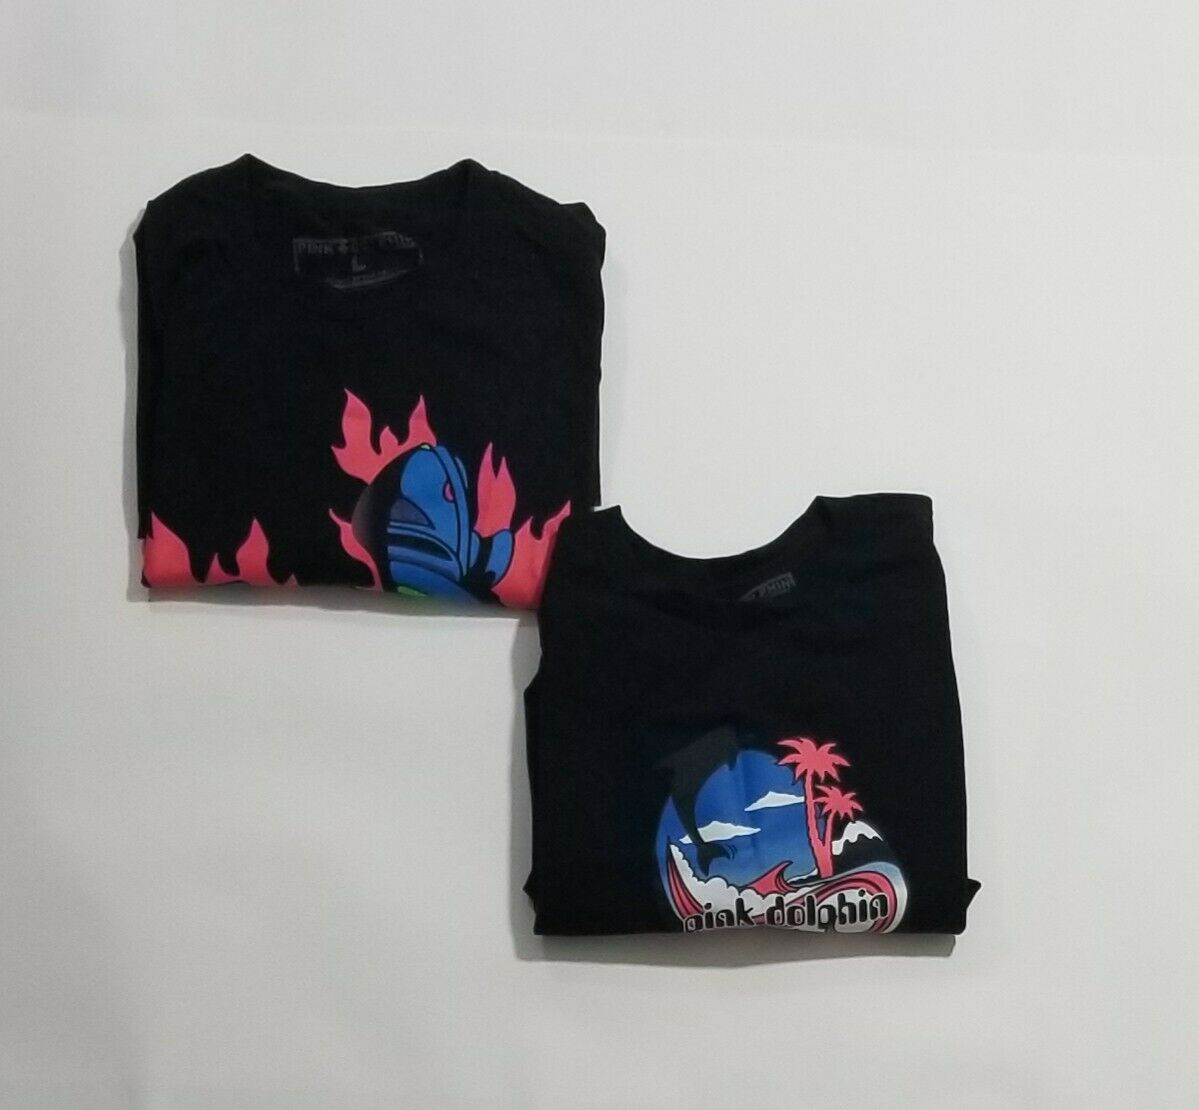 2 PINK DOLPHIN Graphic T-Shirts Black Men Size La… - image 1